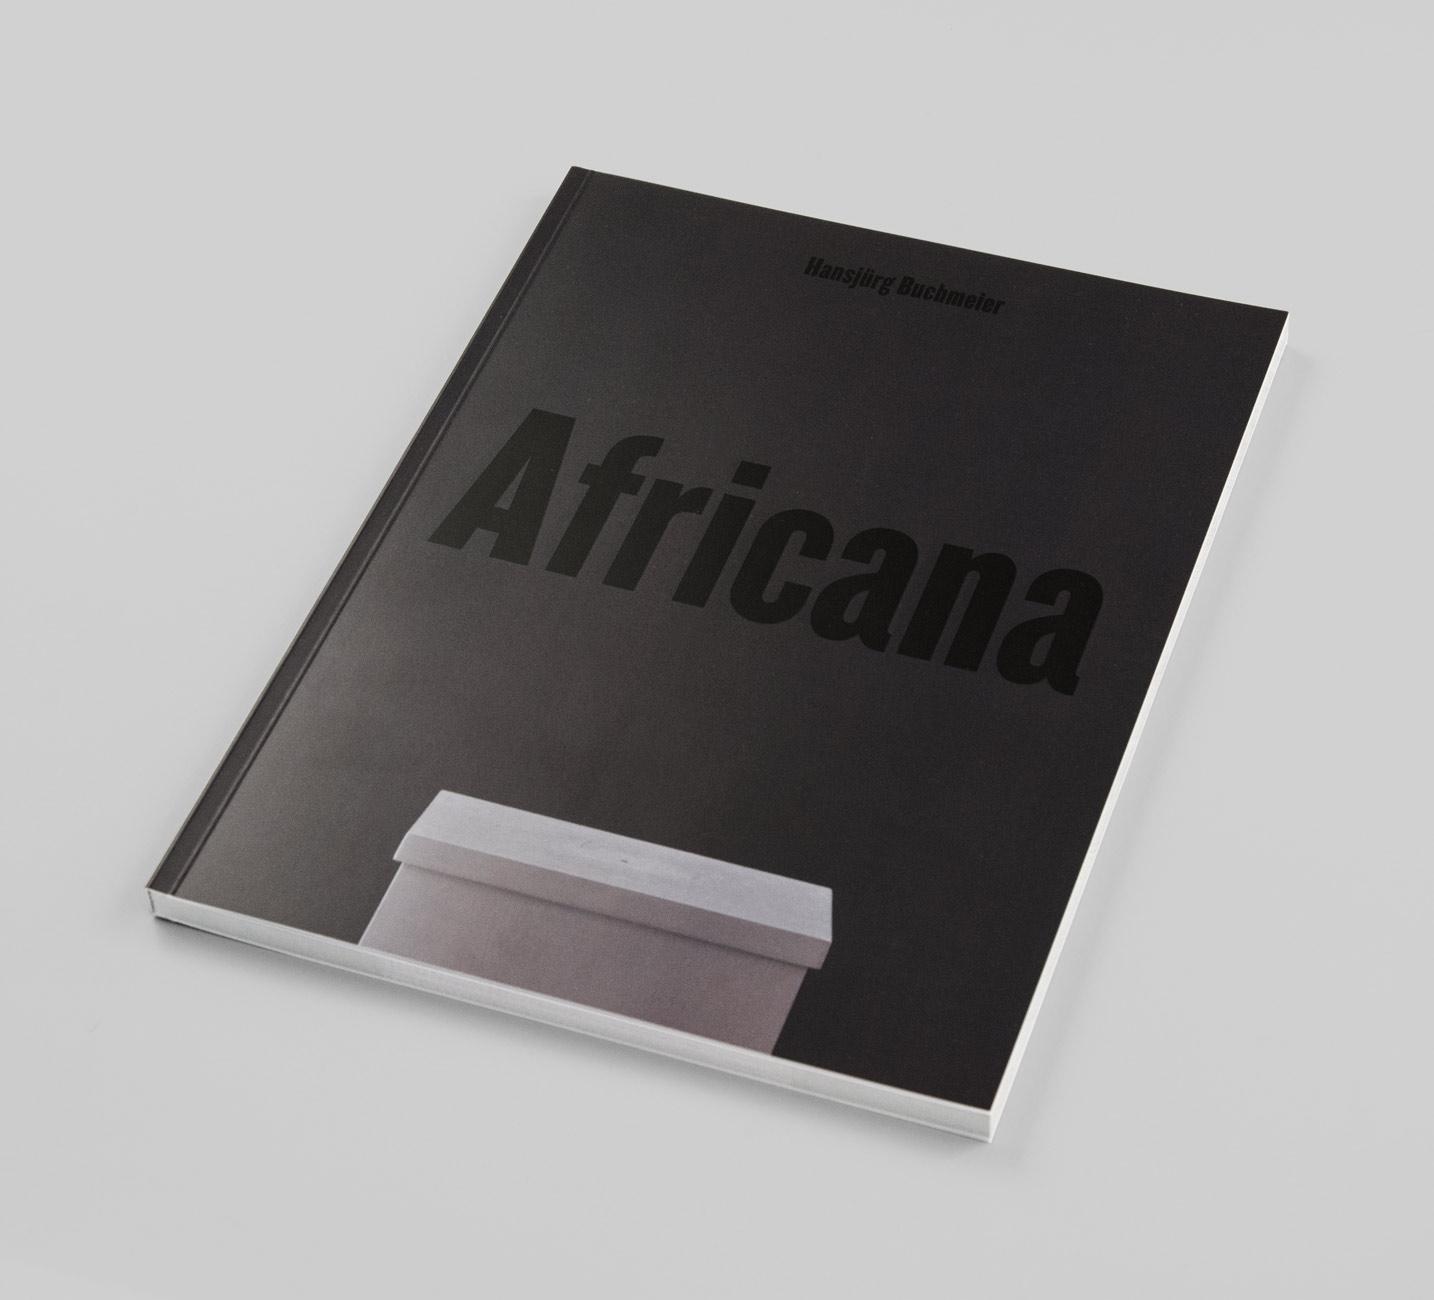 Edition Typoundso Africana Hansjürg Buchmeier